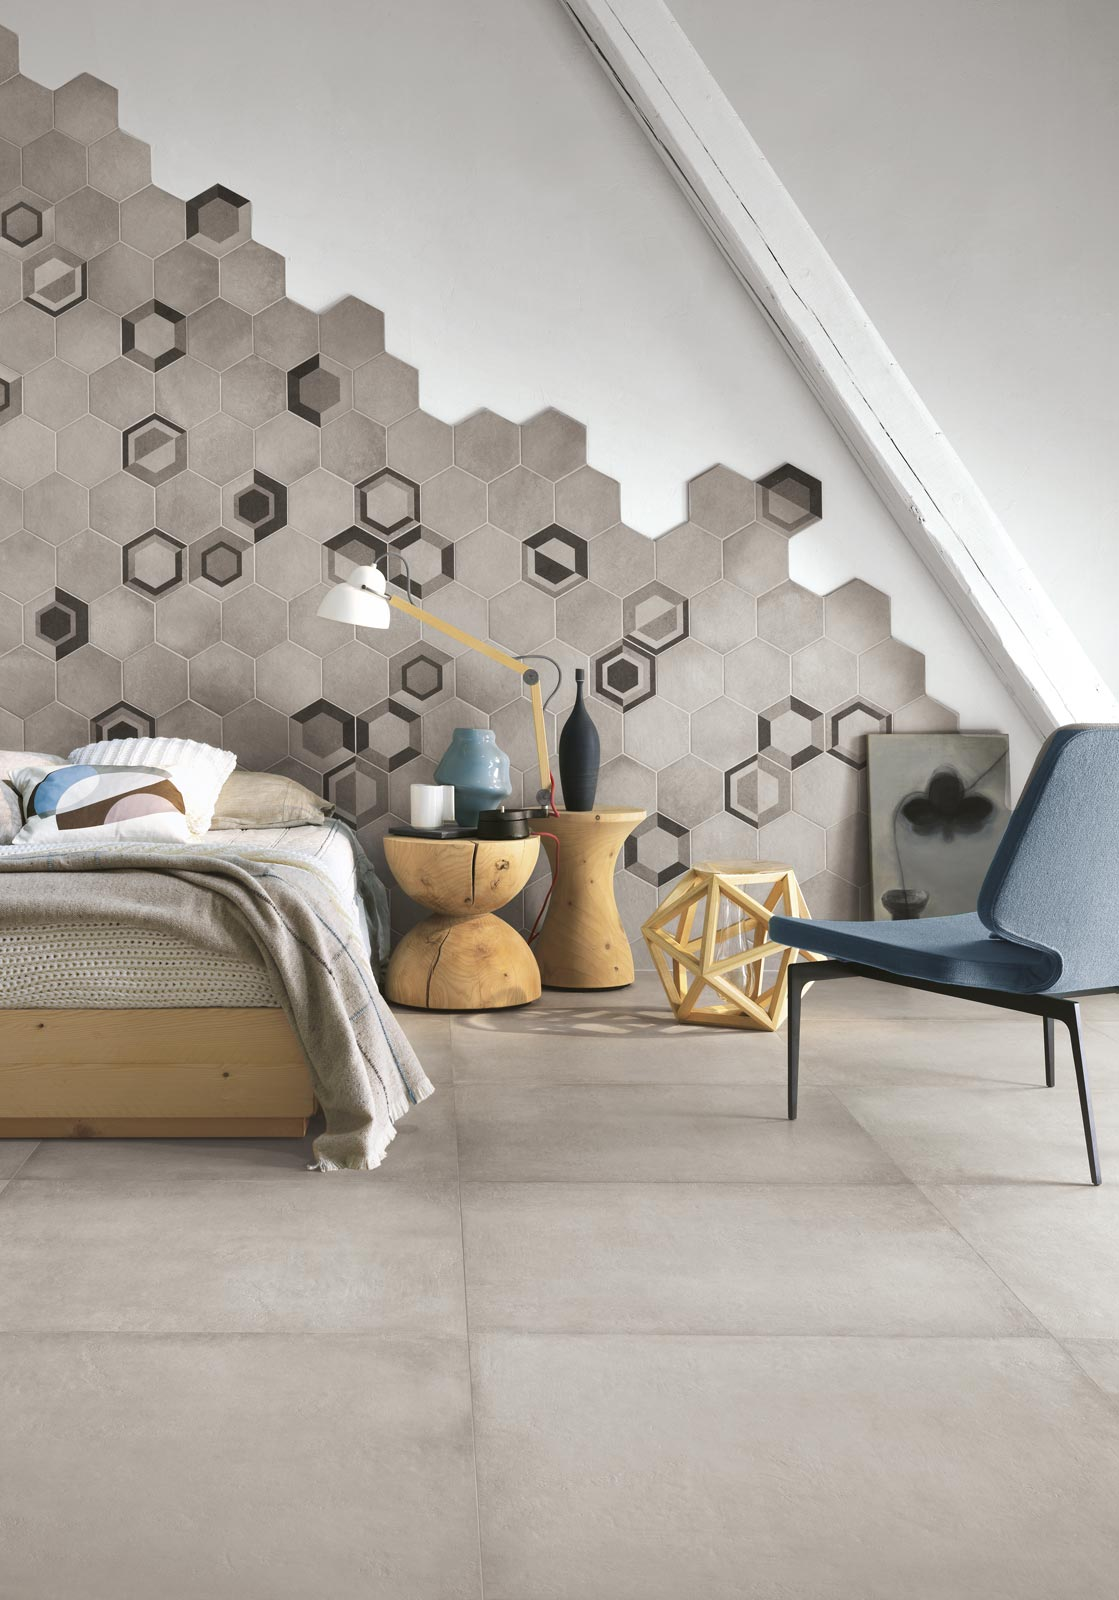 Rewind  Piastrelle effetto mosaico in gres porcellanato